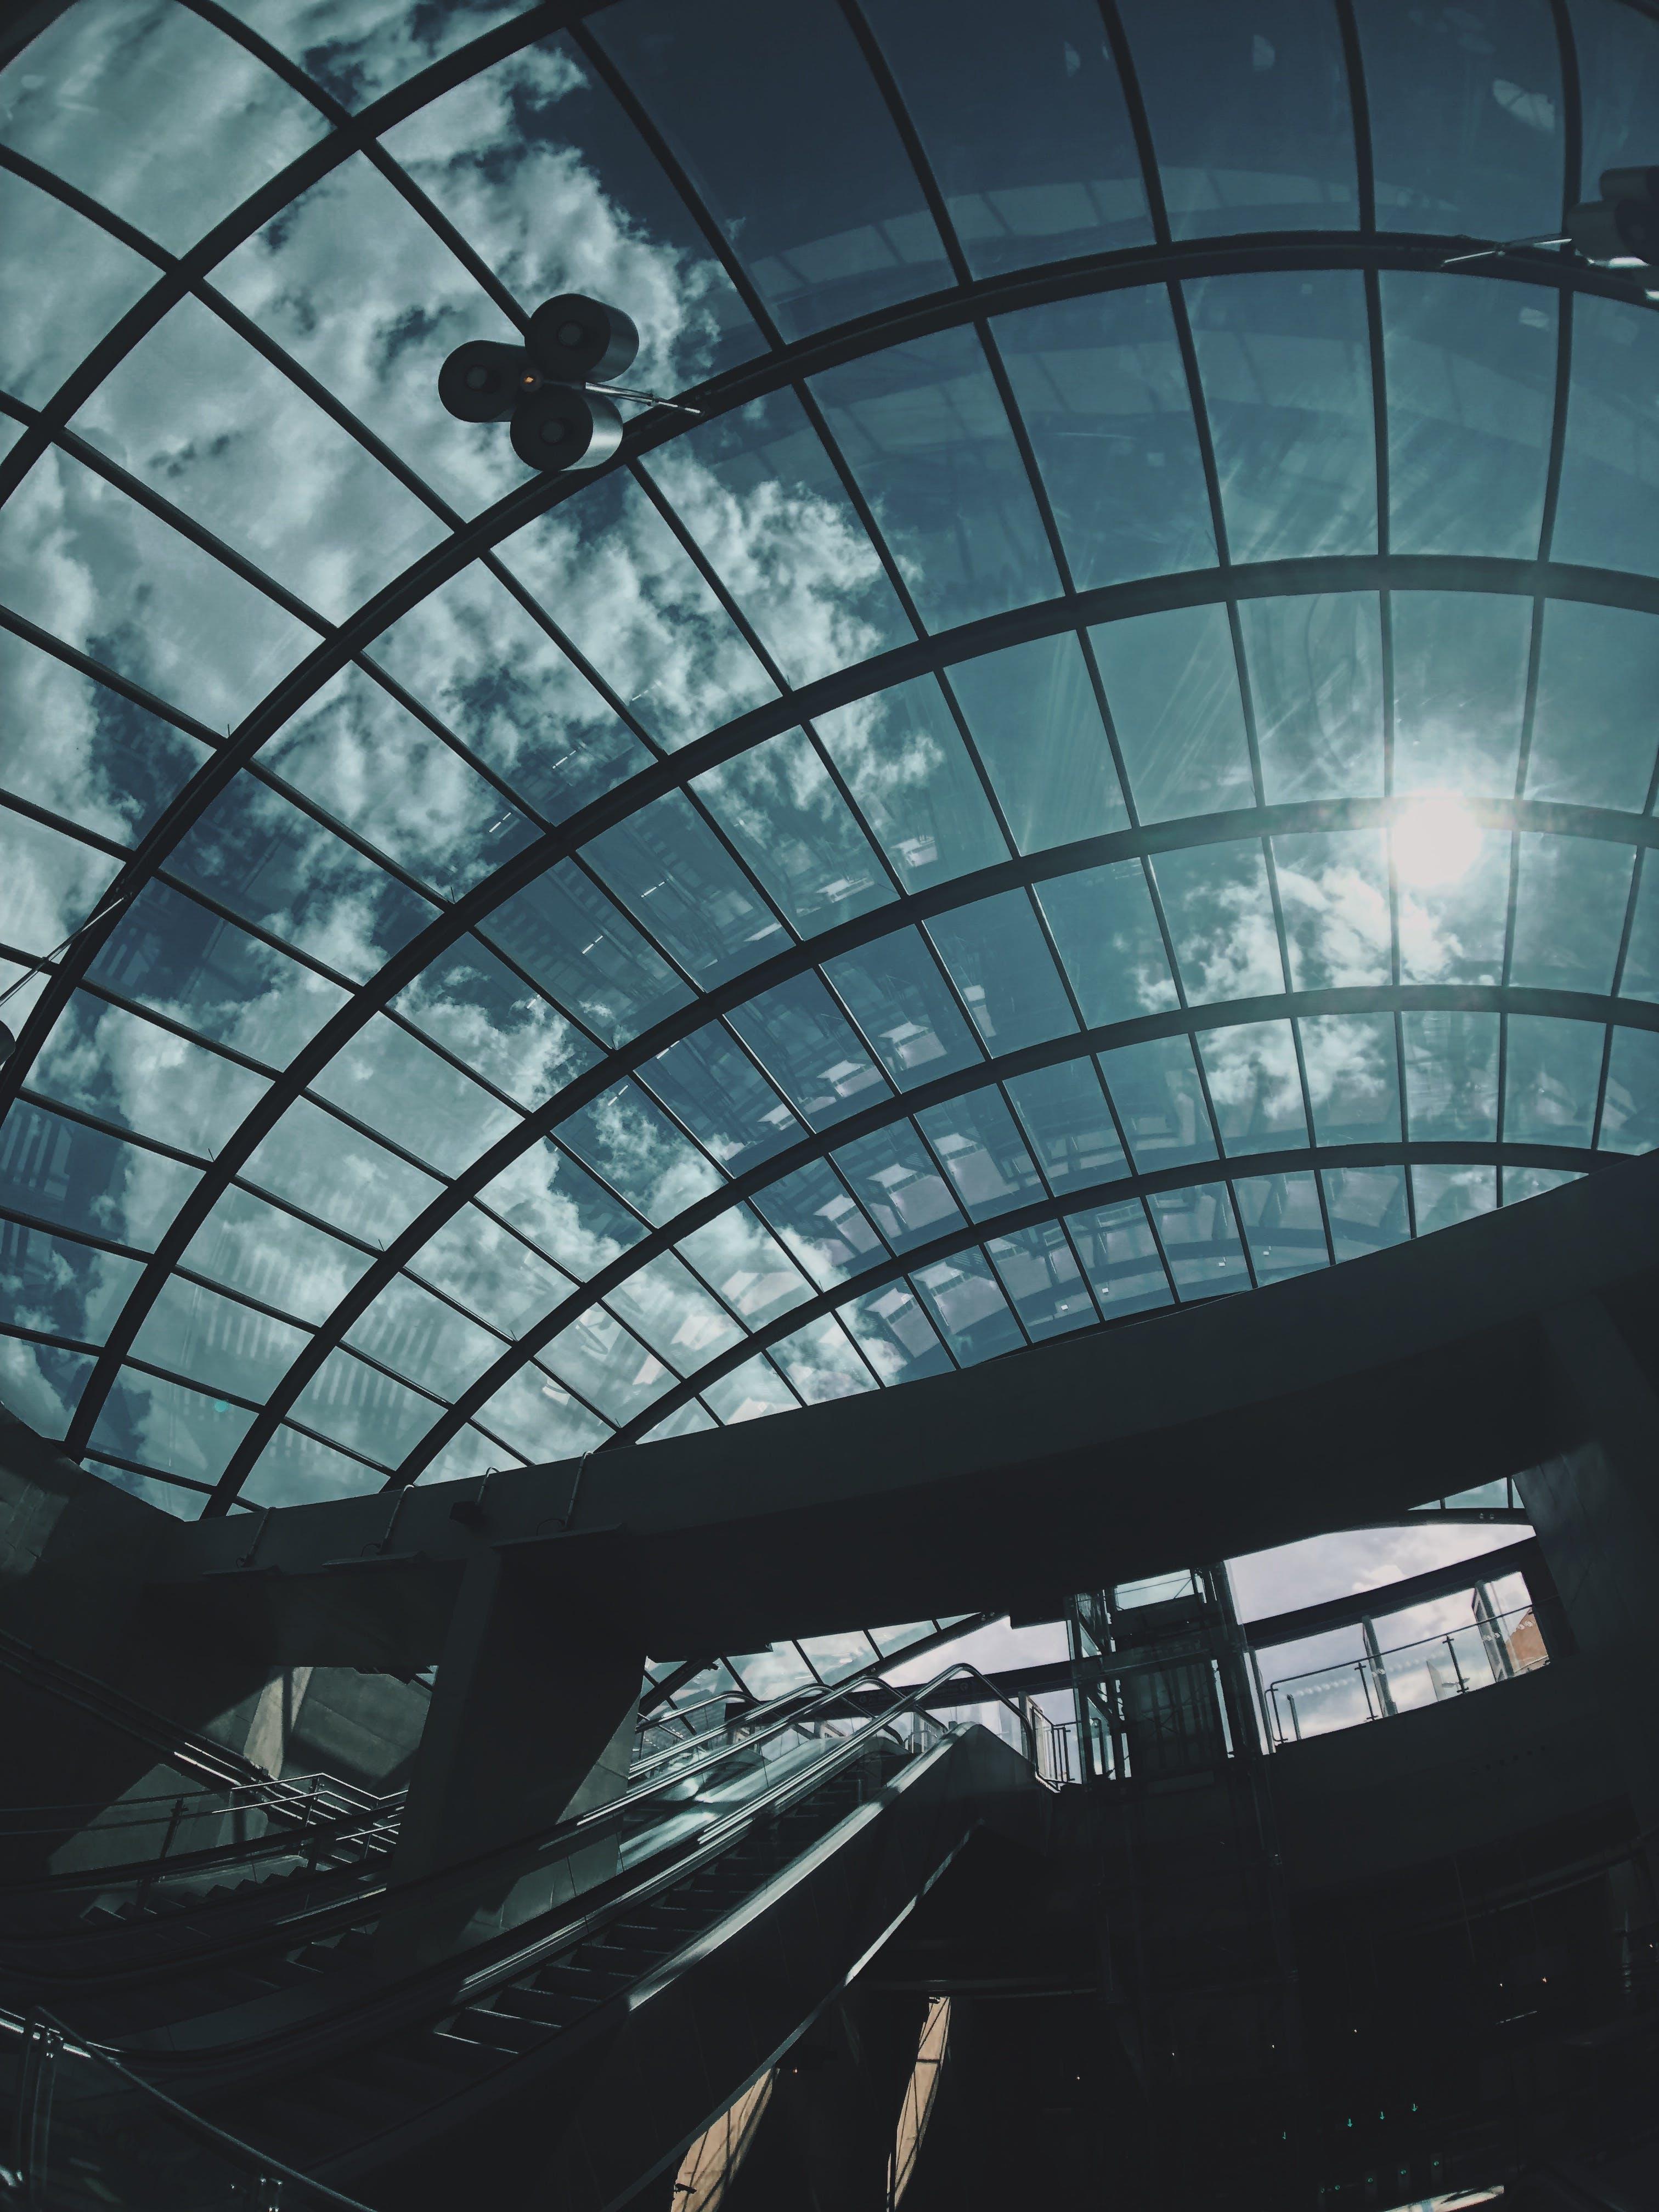 Clear Glass Skylight Under Gray Skies